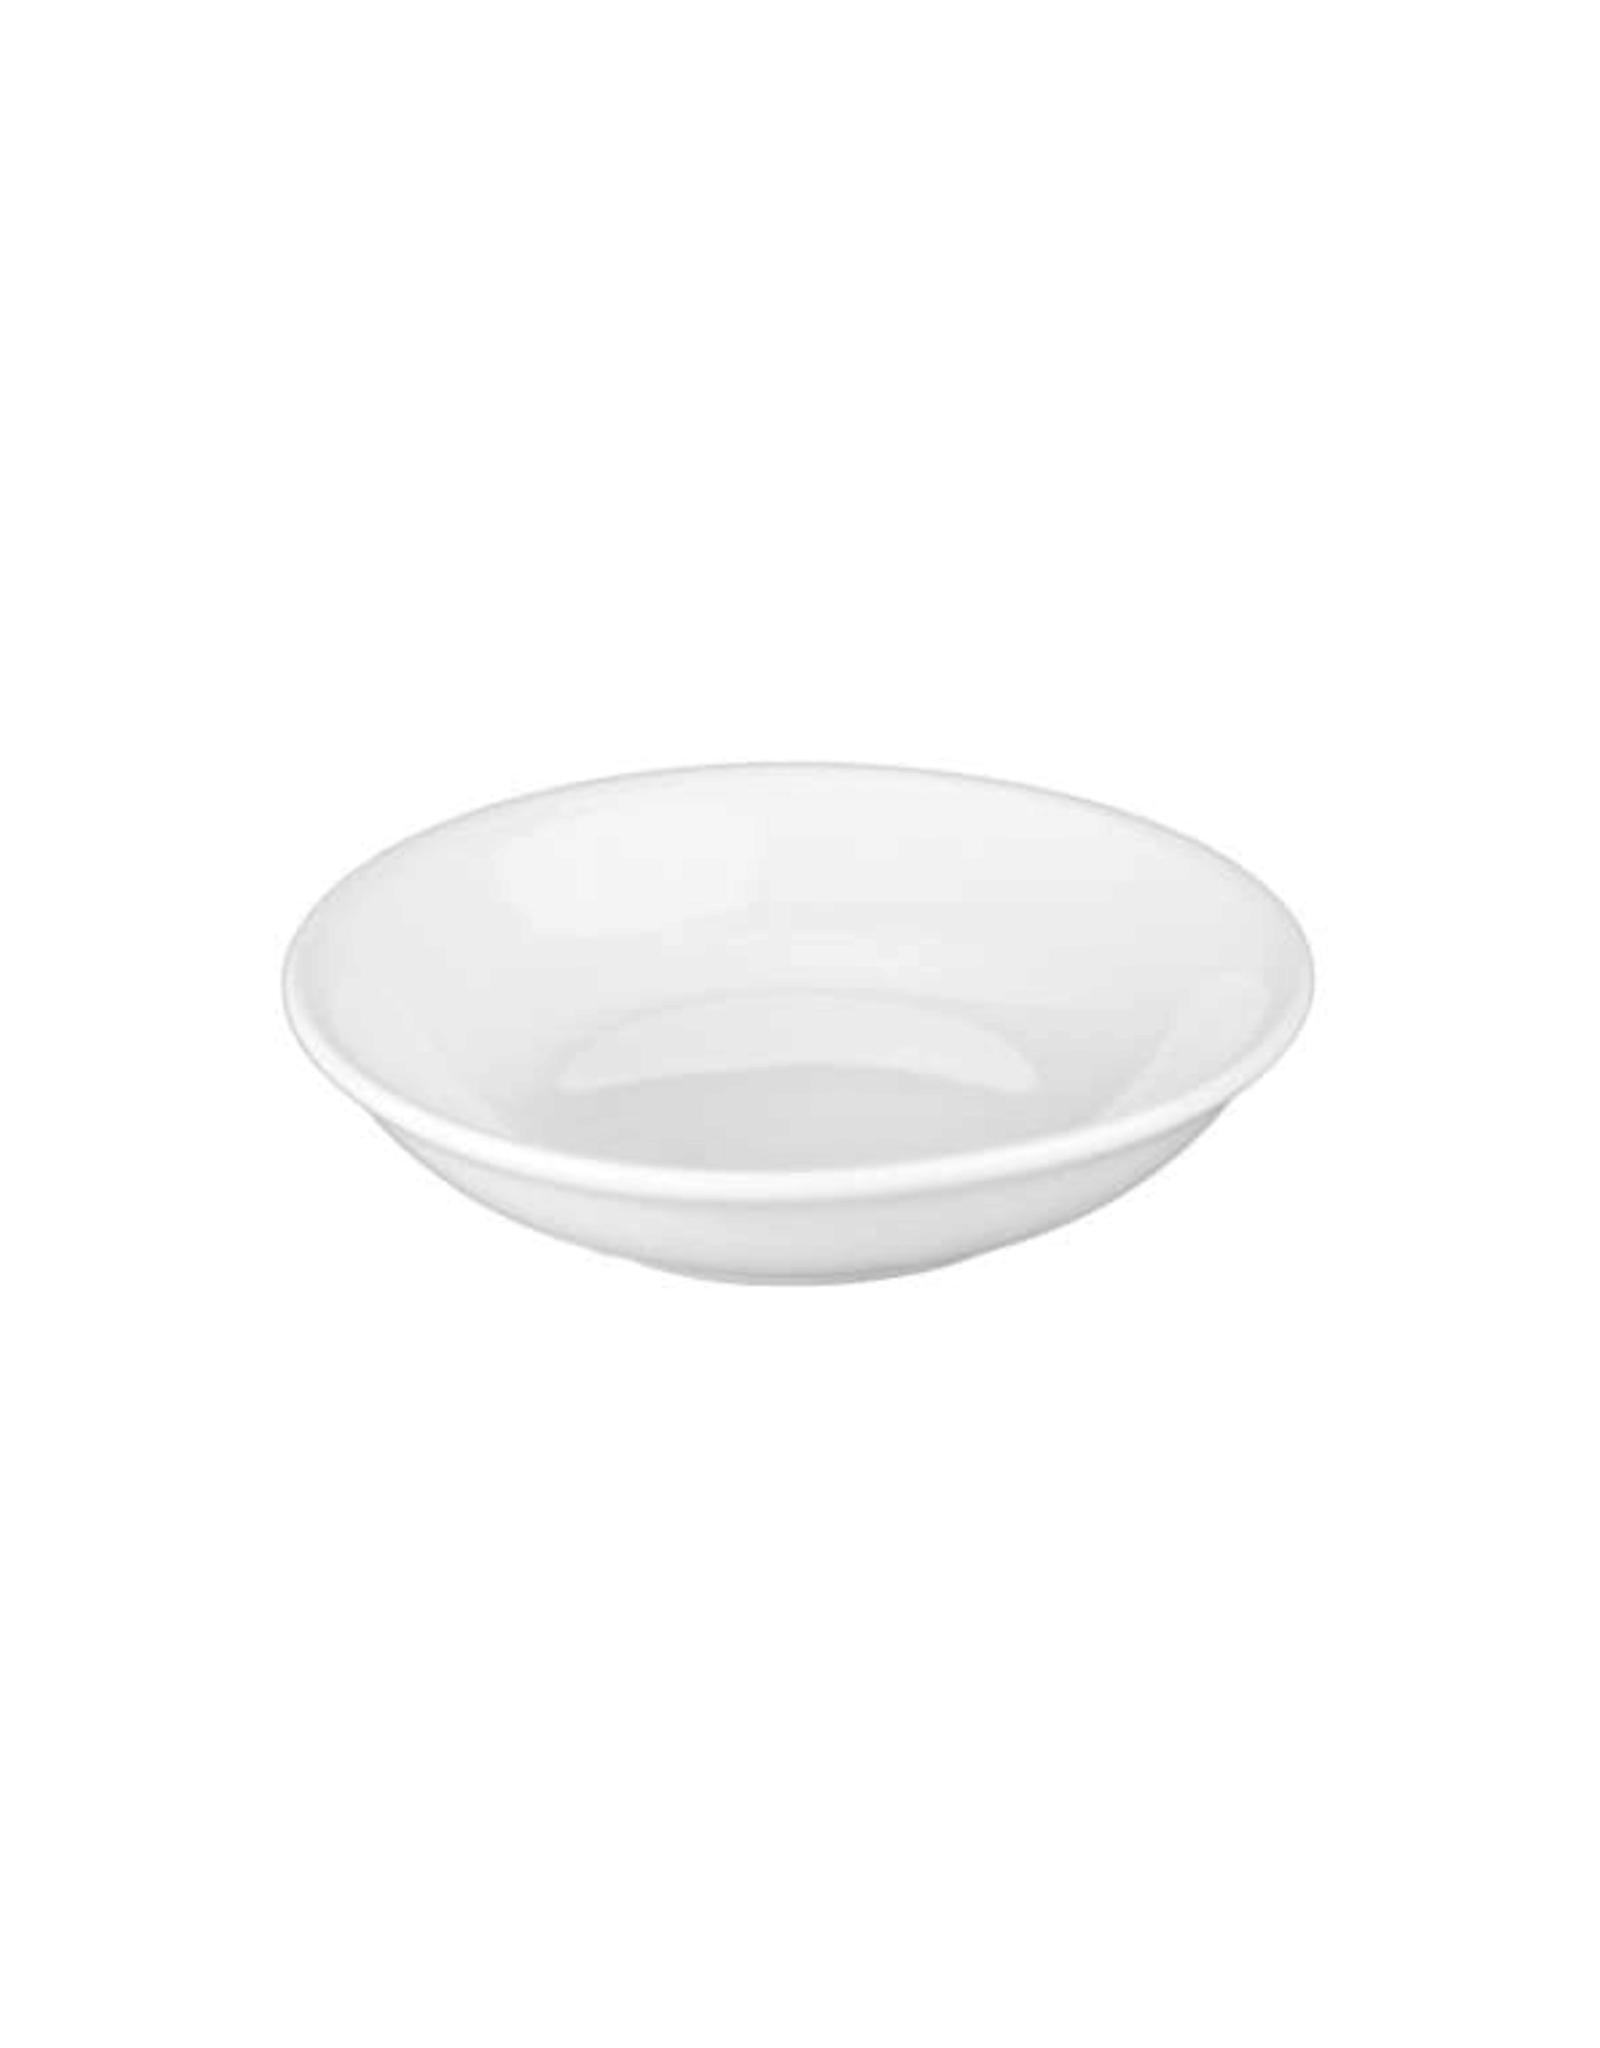 BIA Cordon Bleu Dipping Dish 3 oz